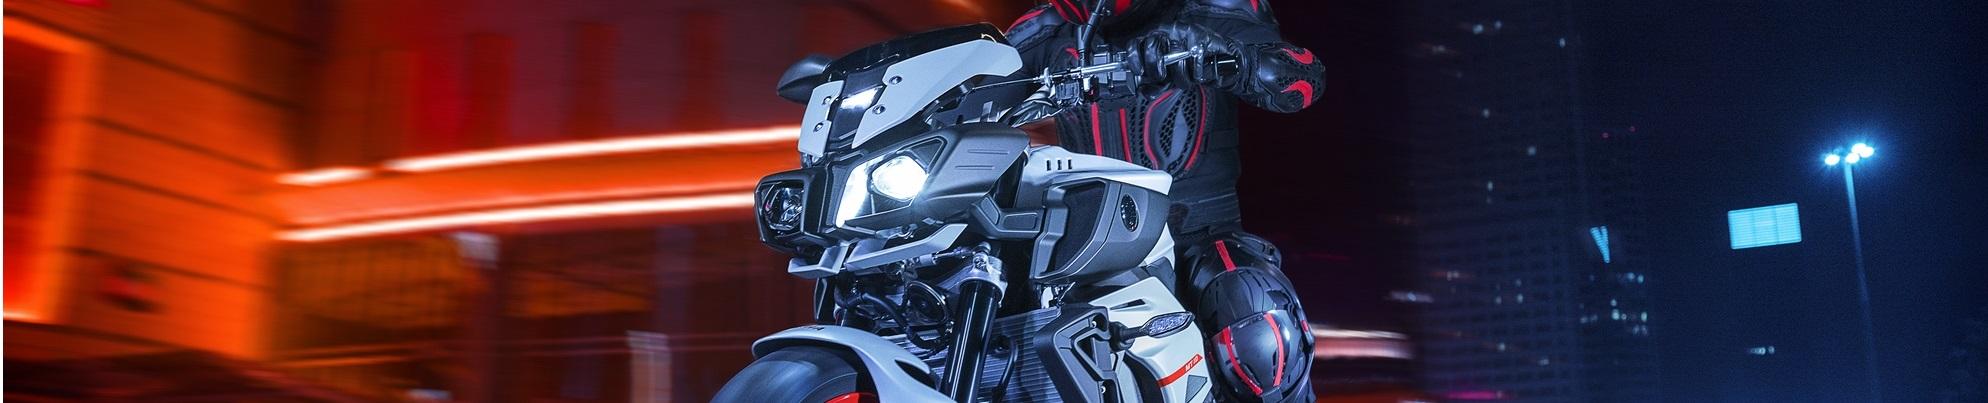 Yamaha MT-10 ABS 2019 - MotorCentrumWest